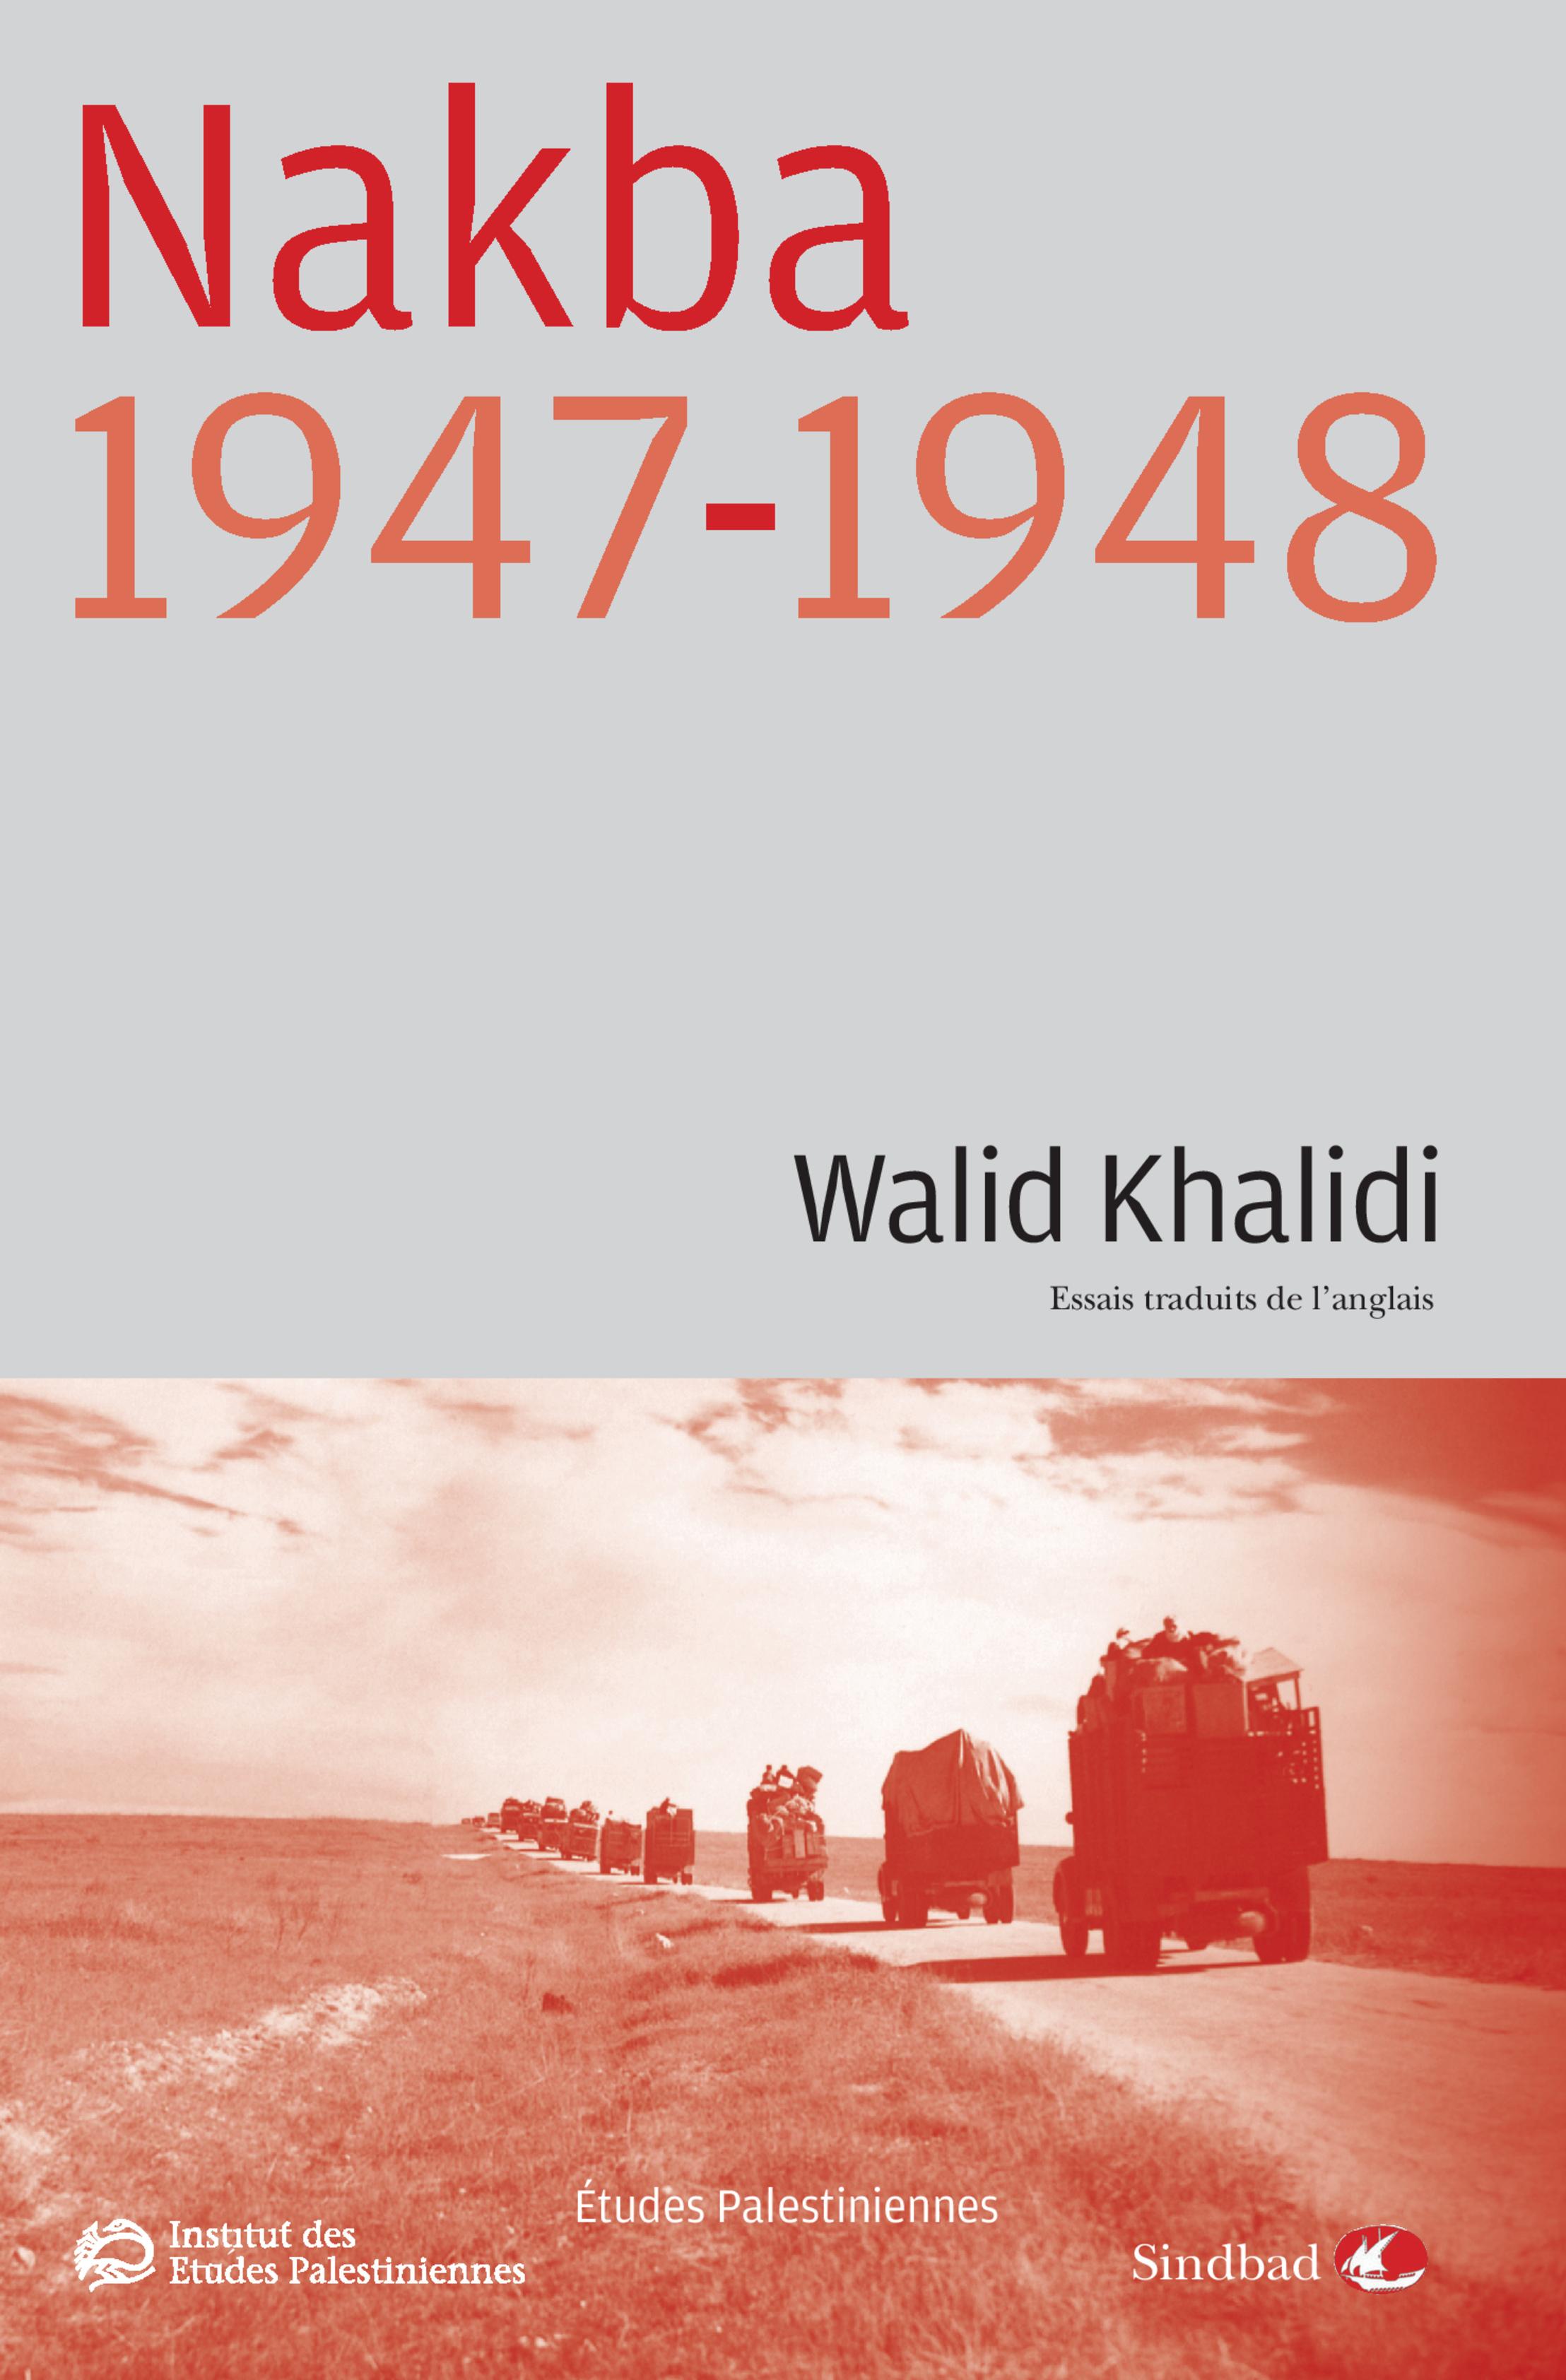 Essai Ecrire La Catastrophe Nakba 1947 1948 De Walid Khalidi